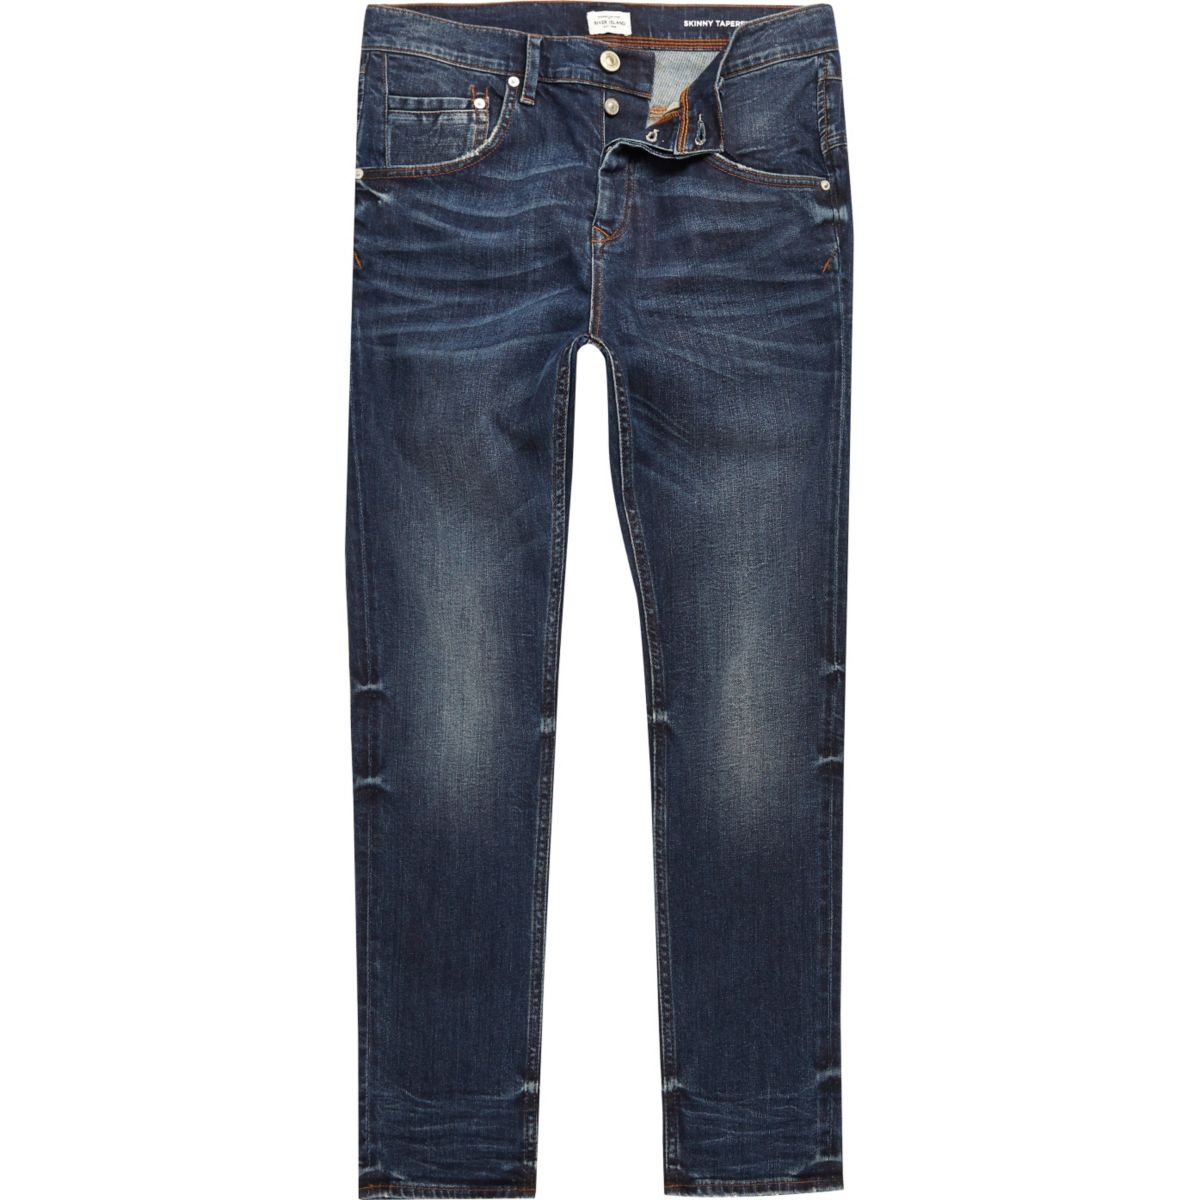 Dark blue wash Chester vintage tapered jeans